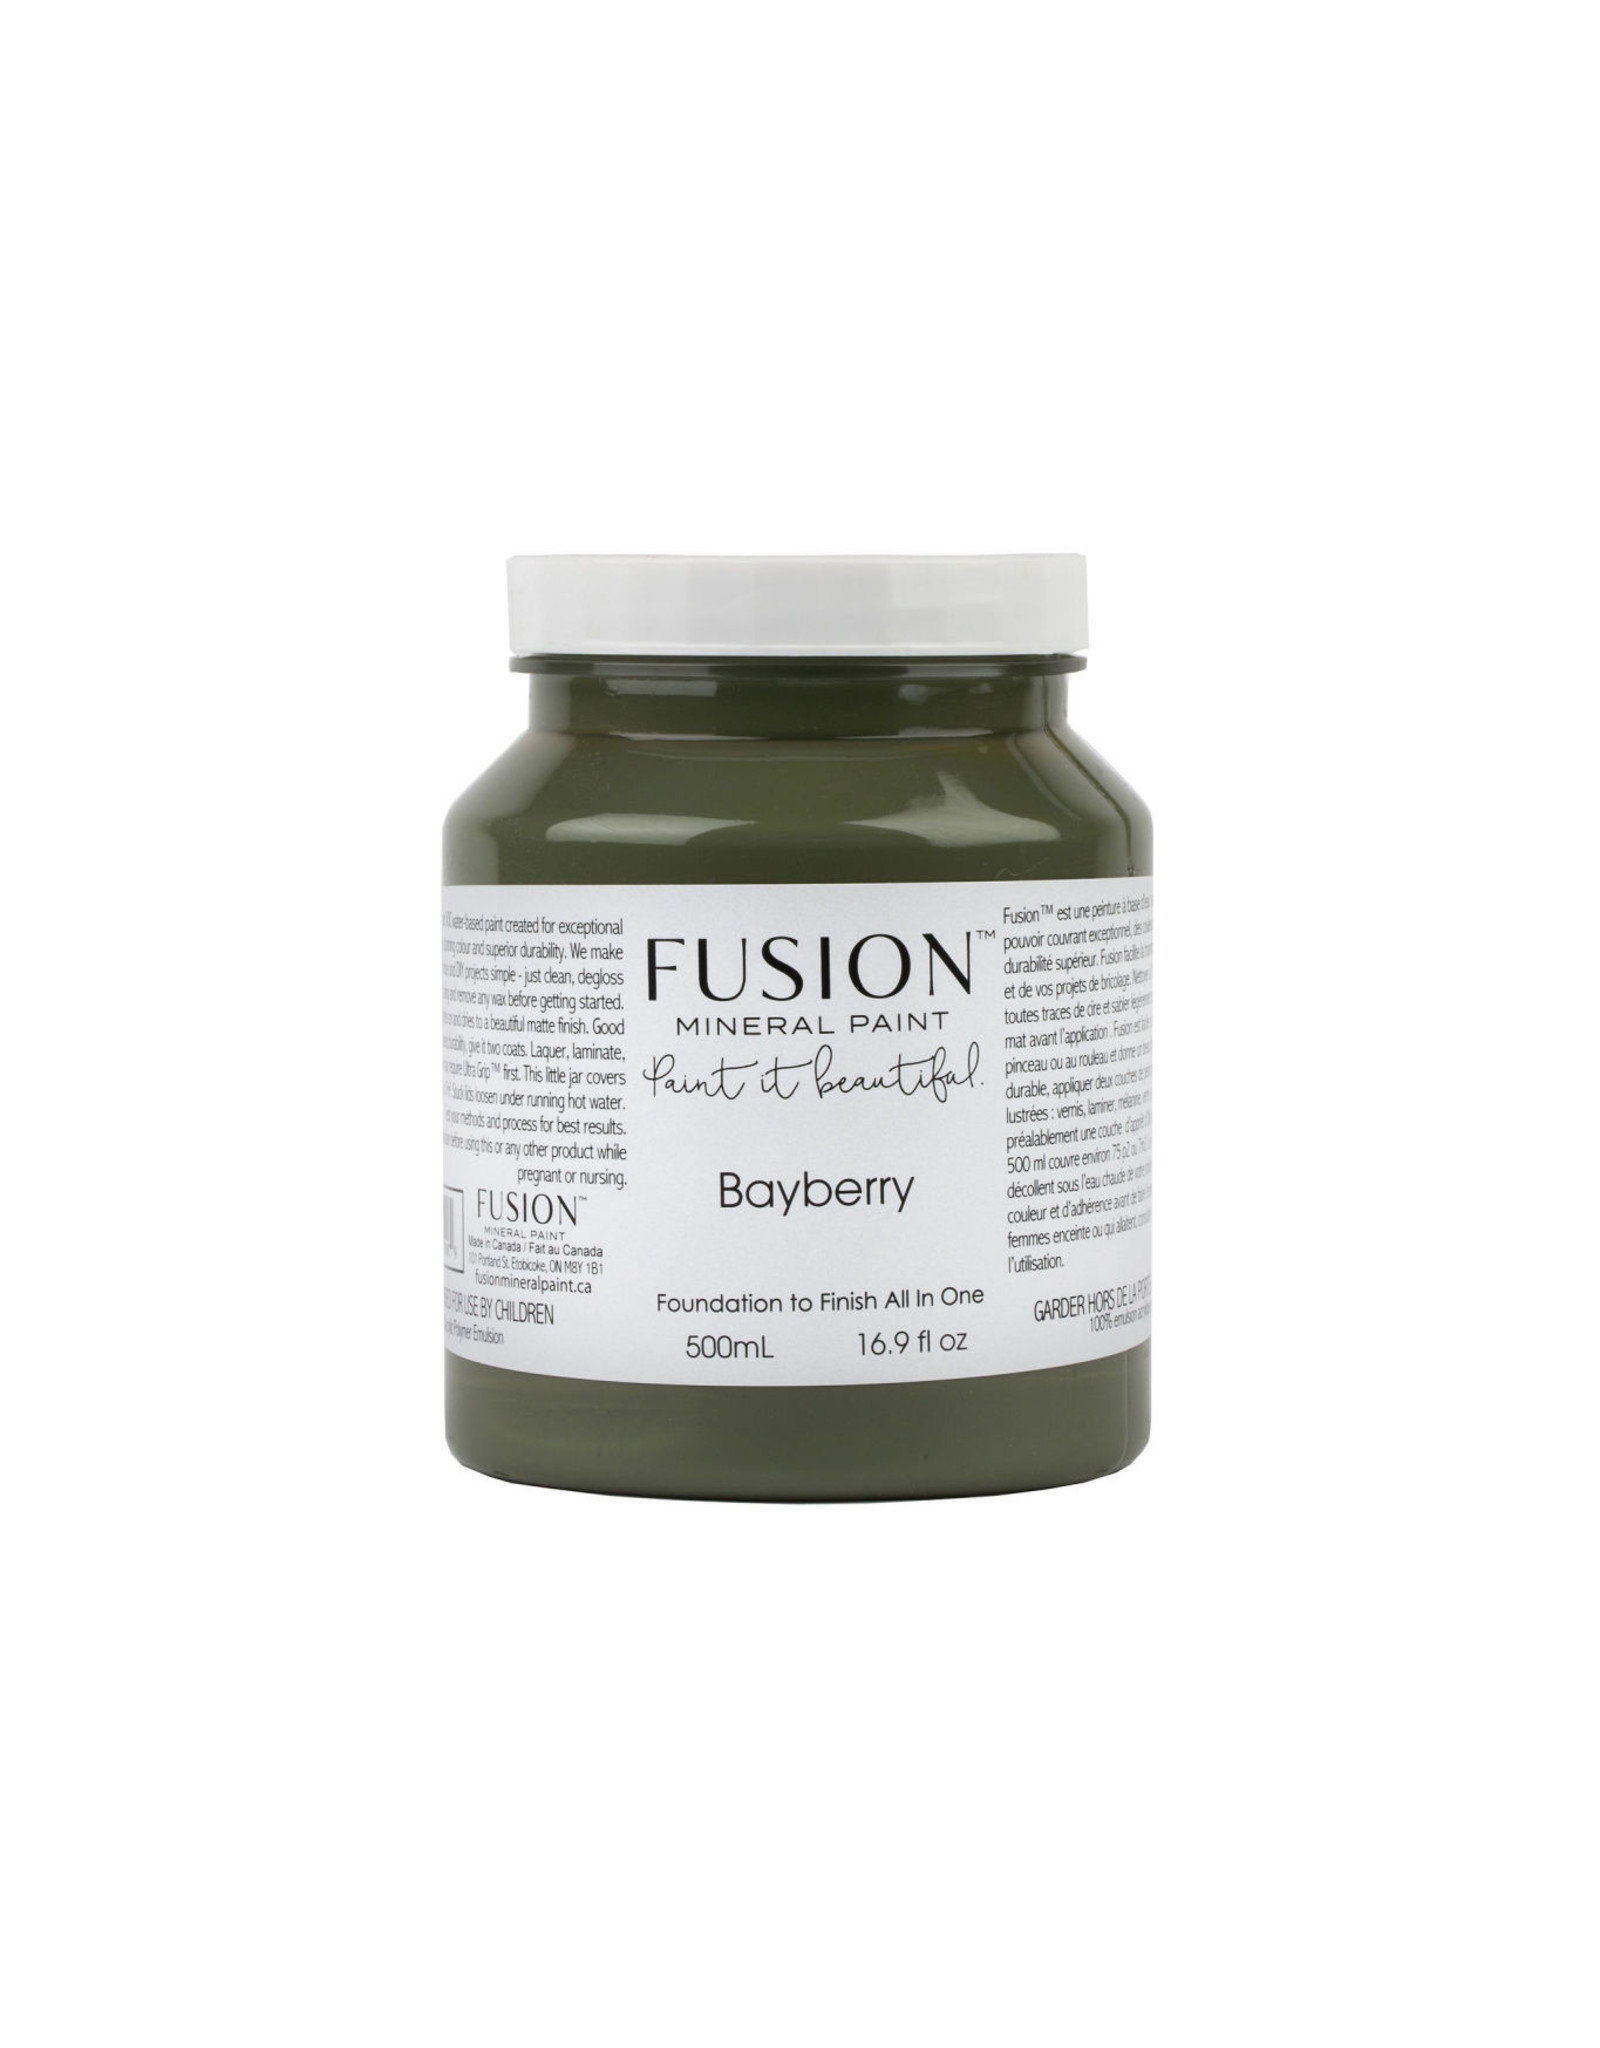 Fusion Mineral Paint Fusion Mineral Paint - Bayberry 500ml